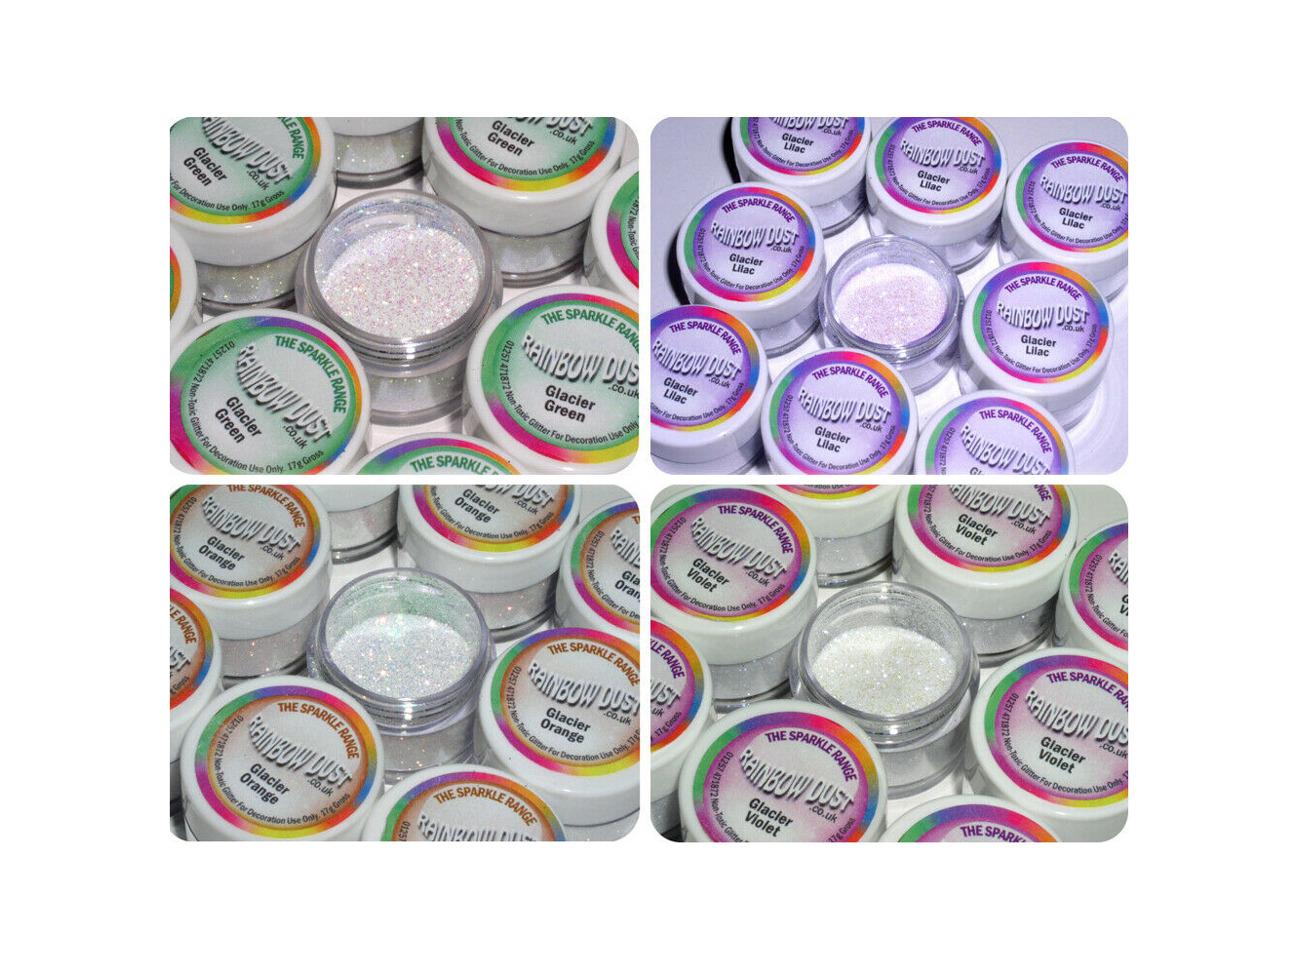 Rainbow Dust Hologram NON-TOXIC Cake Decoration Glitters Sugarcraft Sparkle